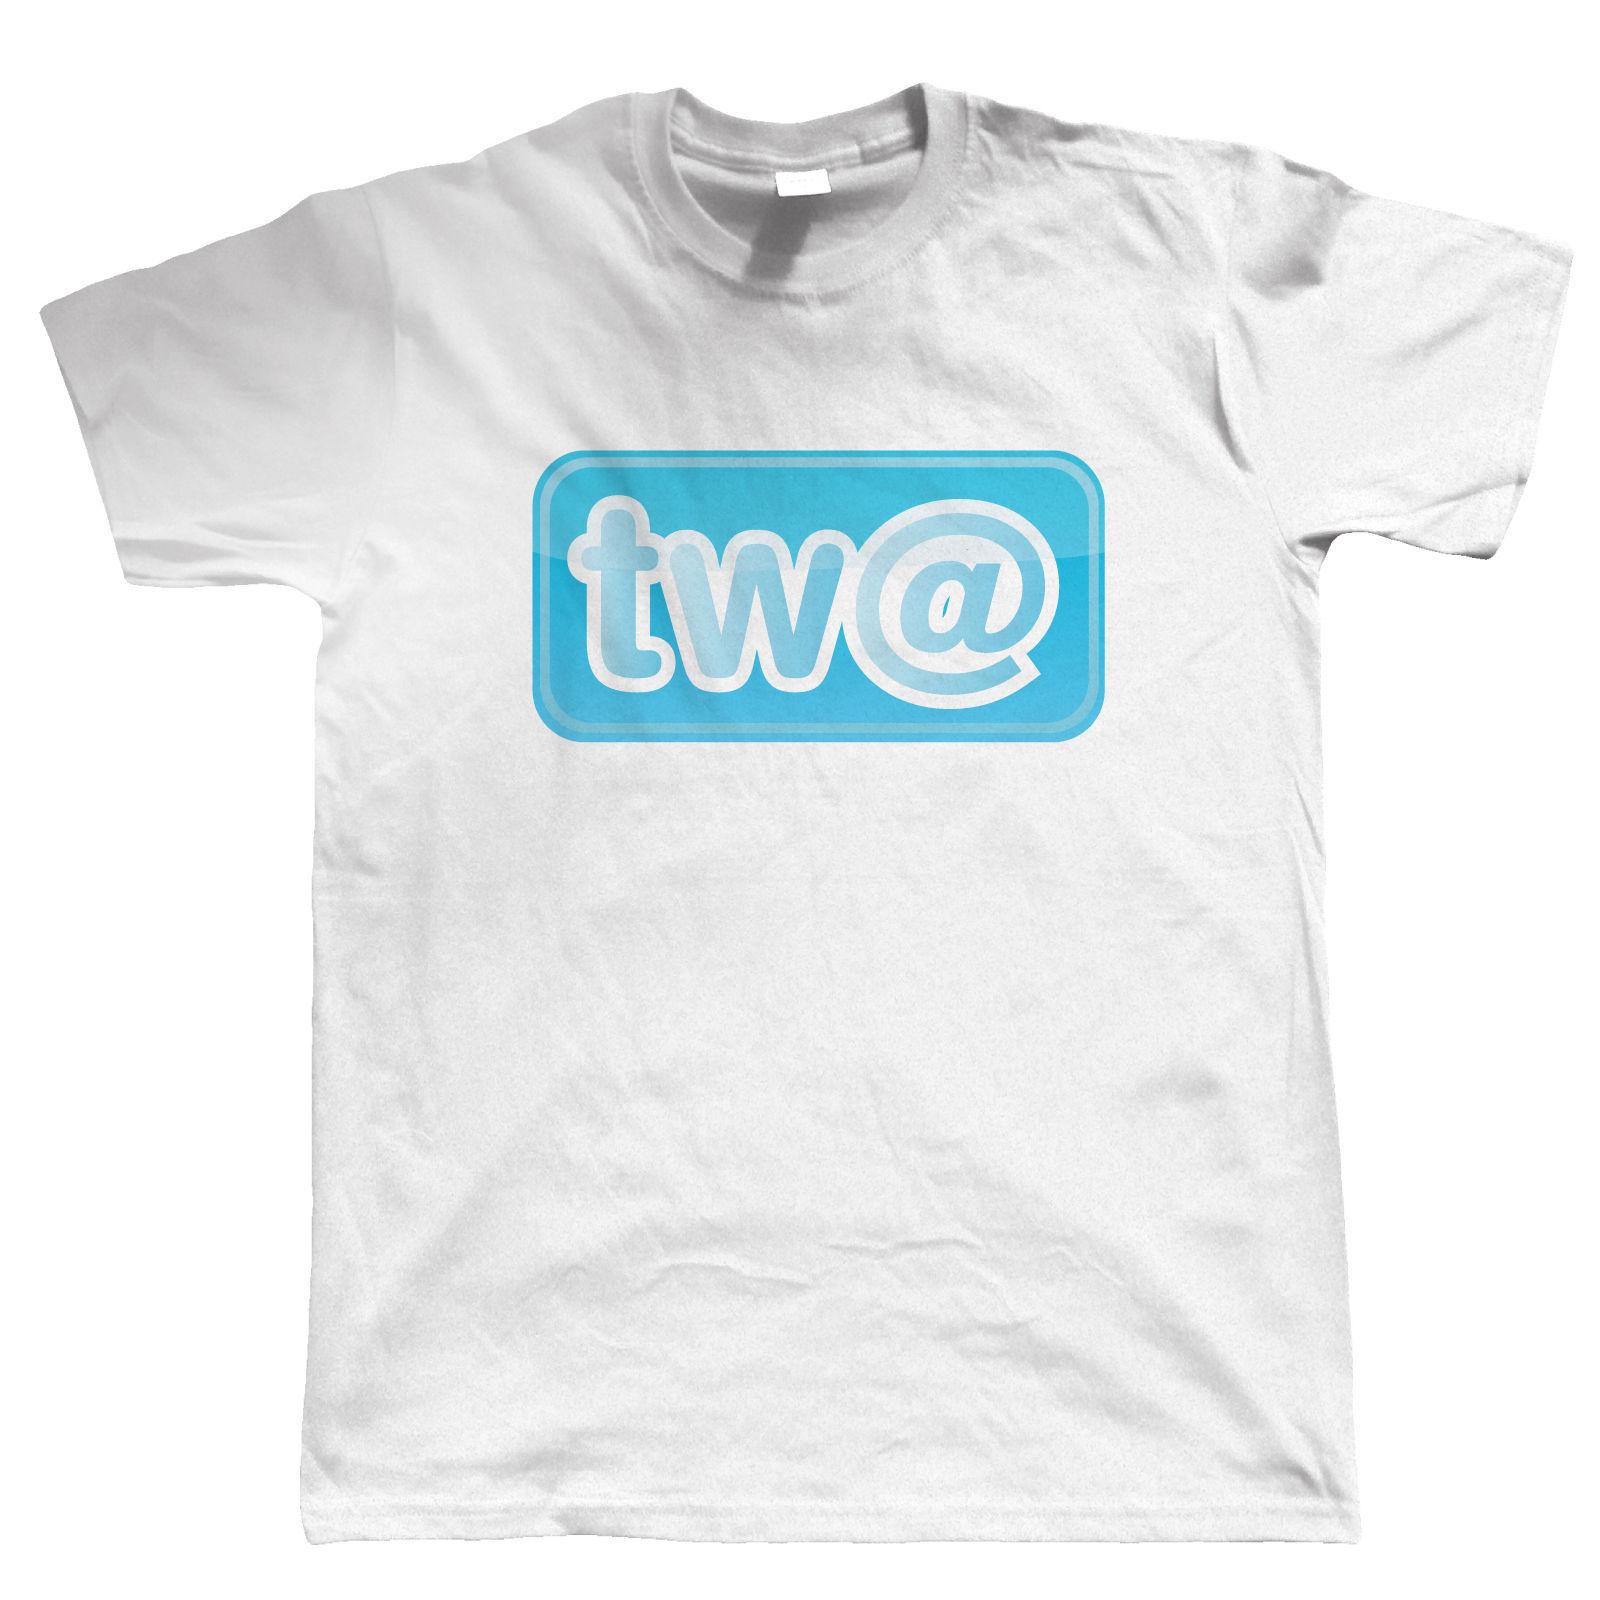 2019 Venta caliente 100% algodón TW @, camiseta de lema divertido para hombres